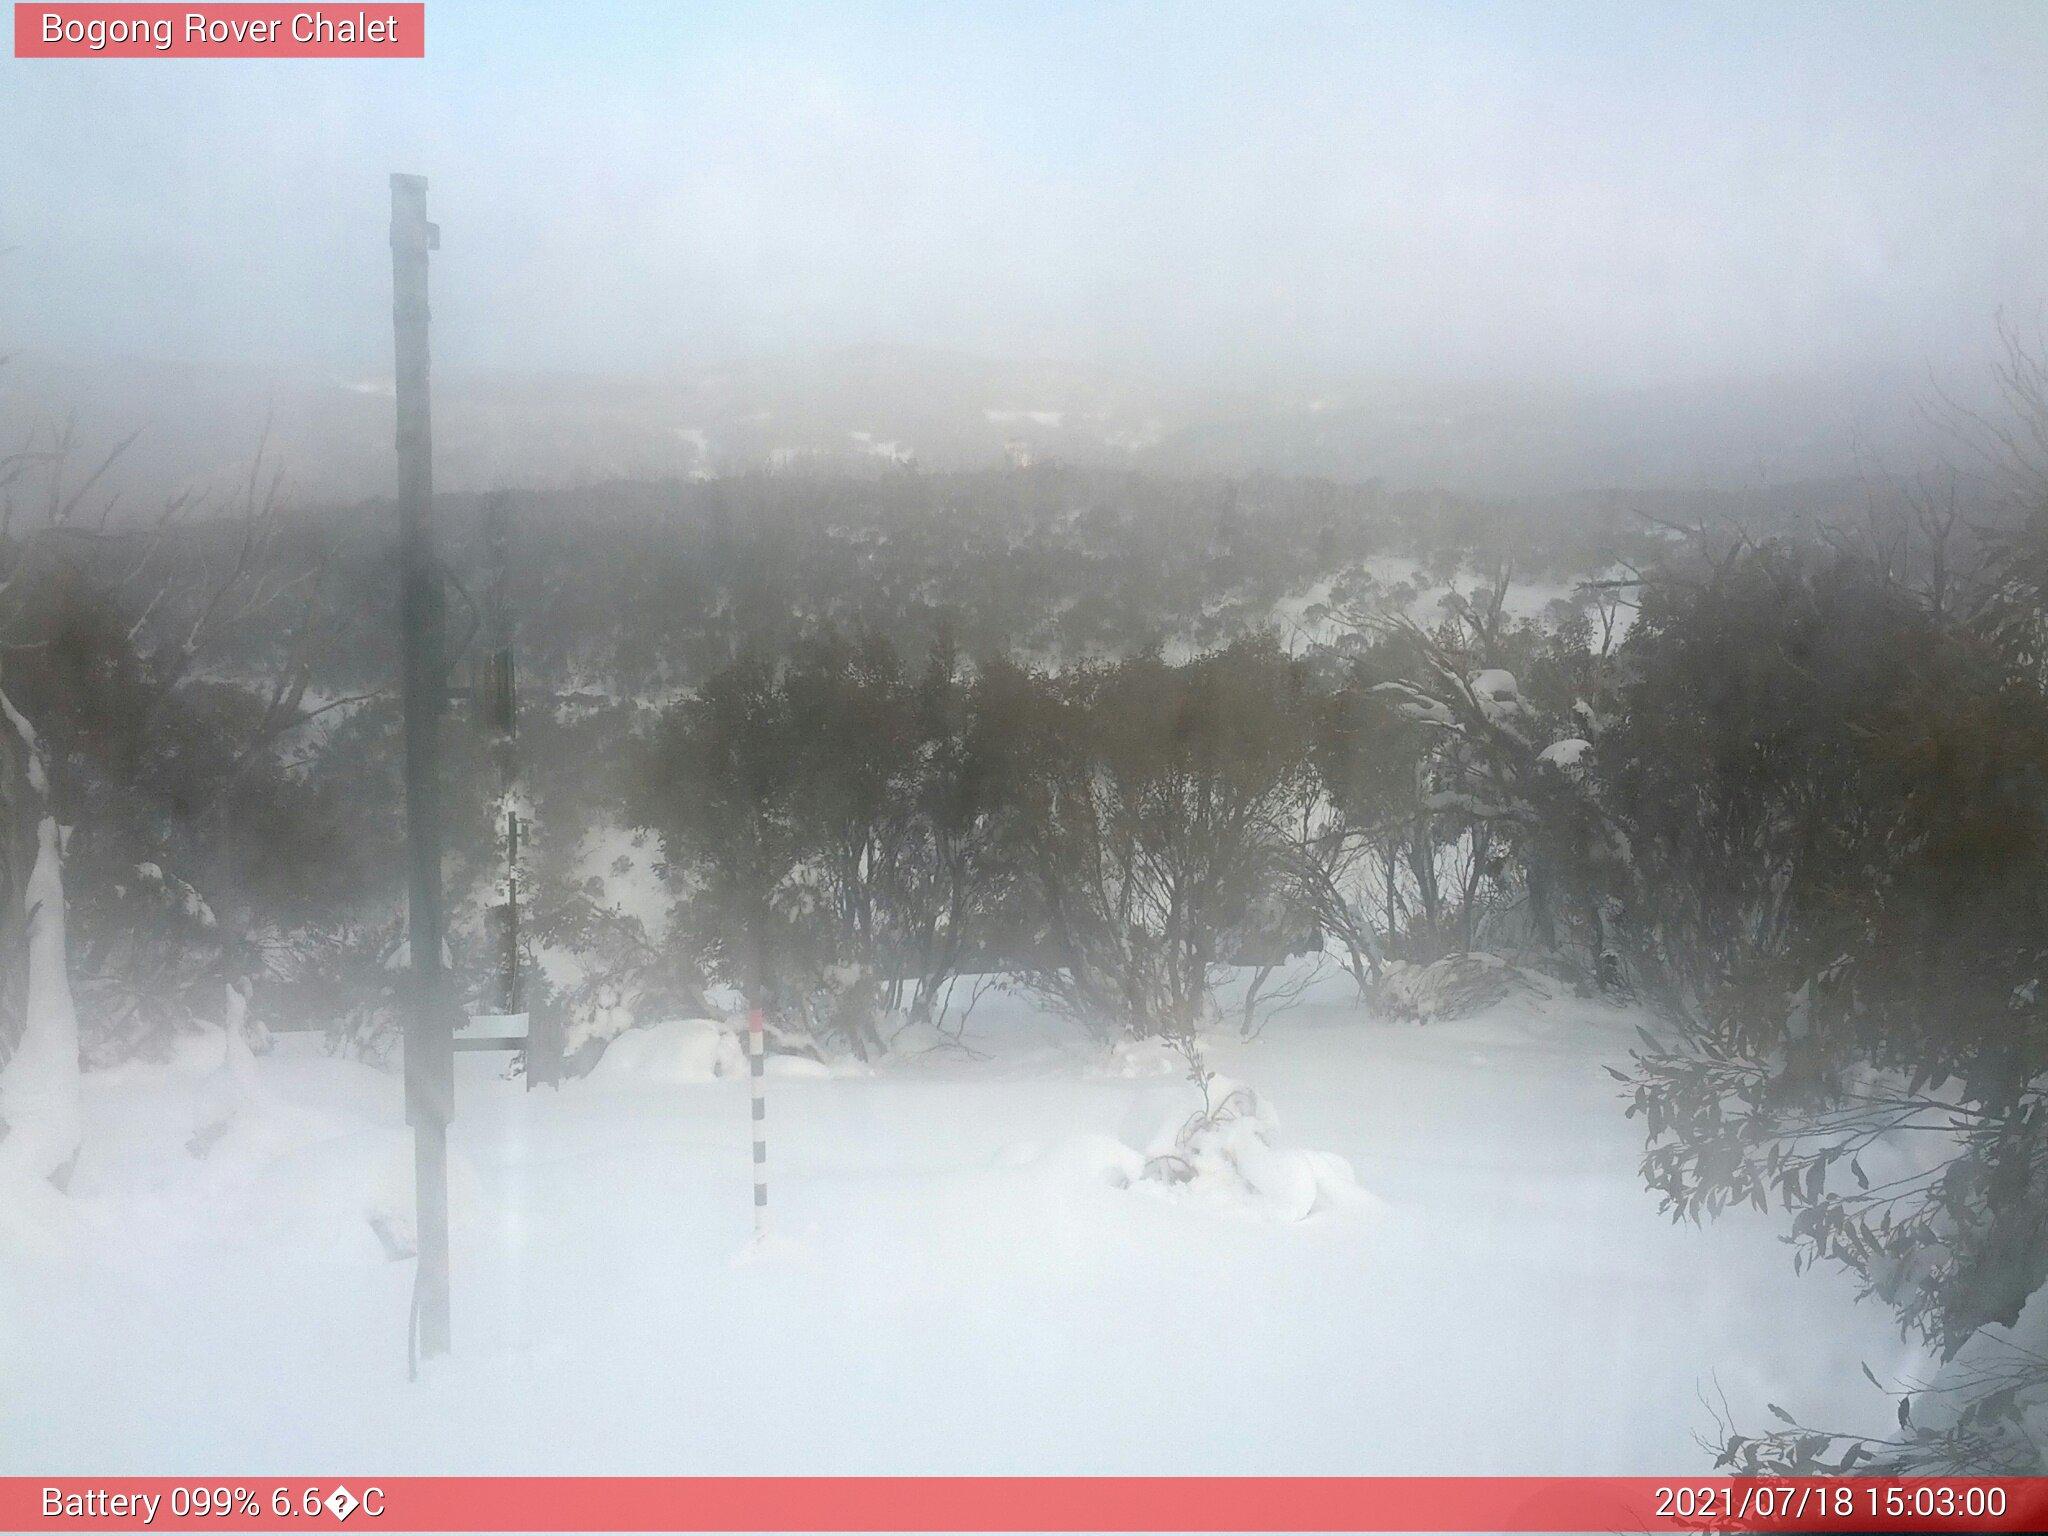 Bogong Rover  Chalet  18.7.21 snow cam.jpg 1.2.jpg